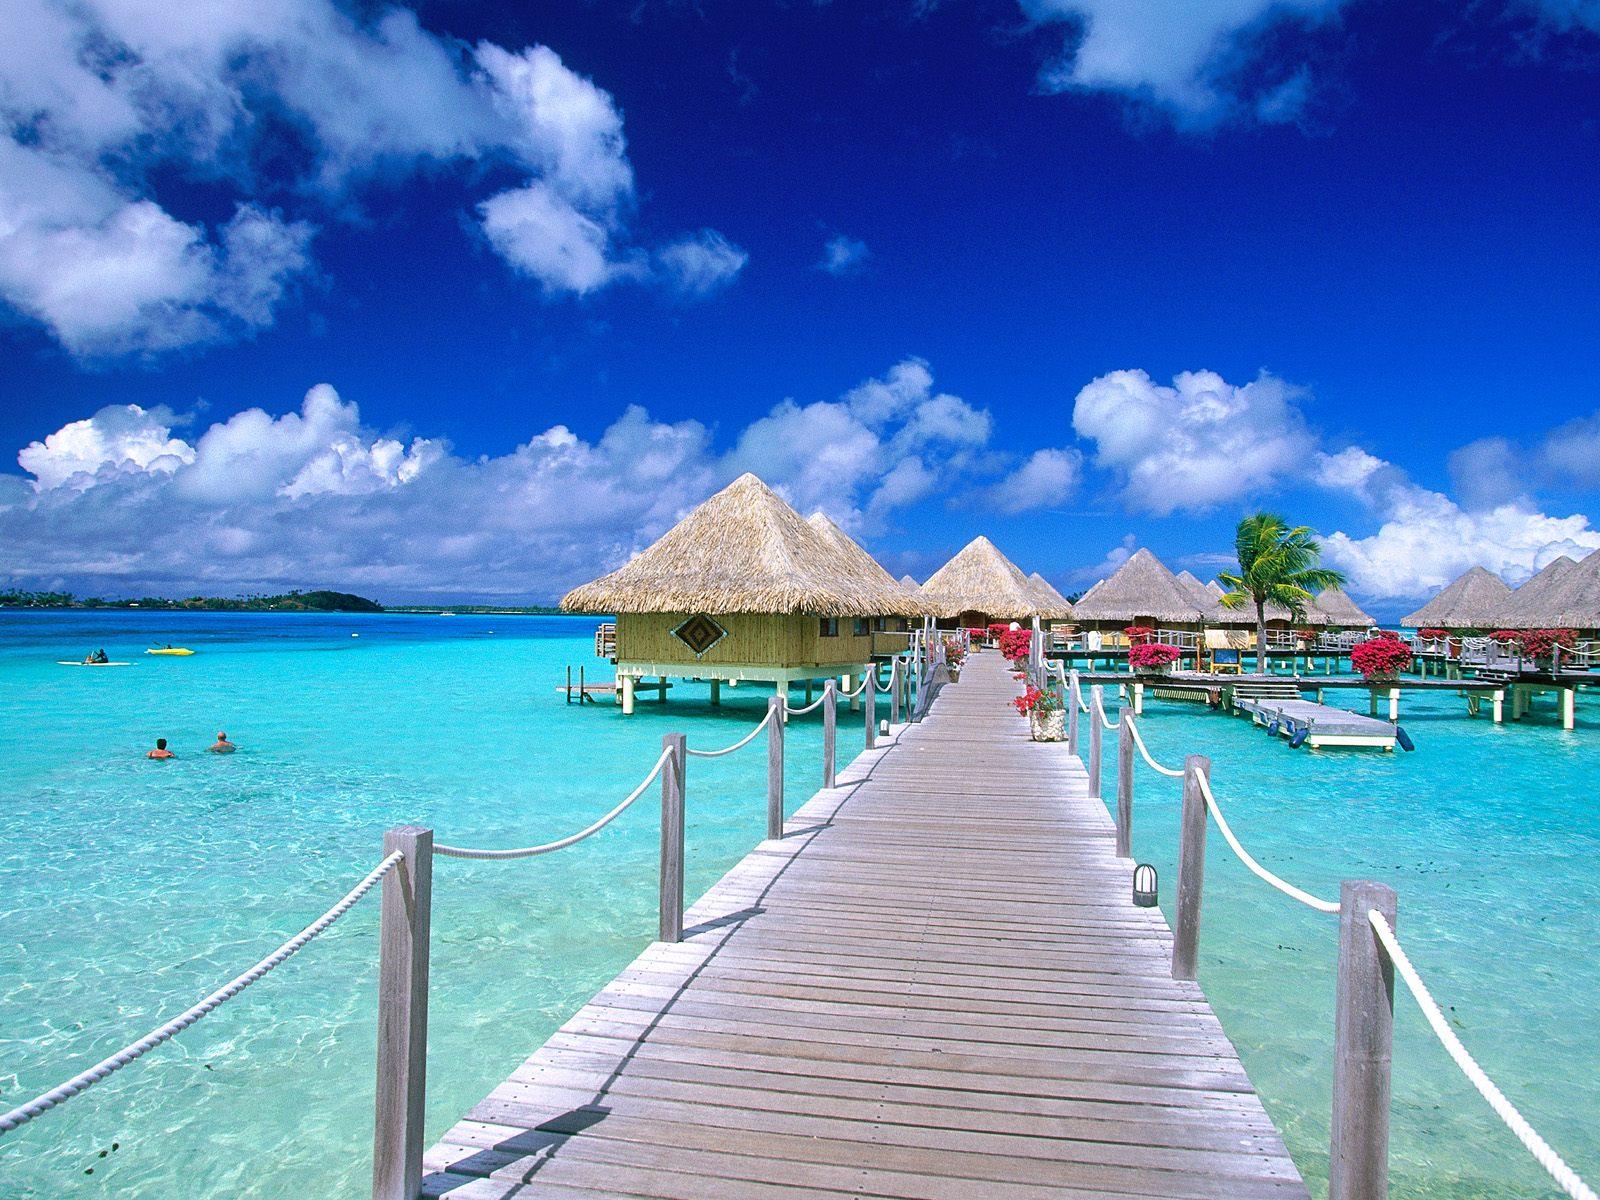 French Polynesia Tahiti Island Wallpapers HD Photos Beautiful Tourism 1600x1200